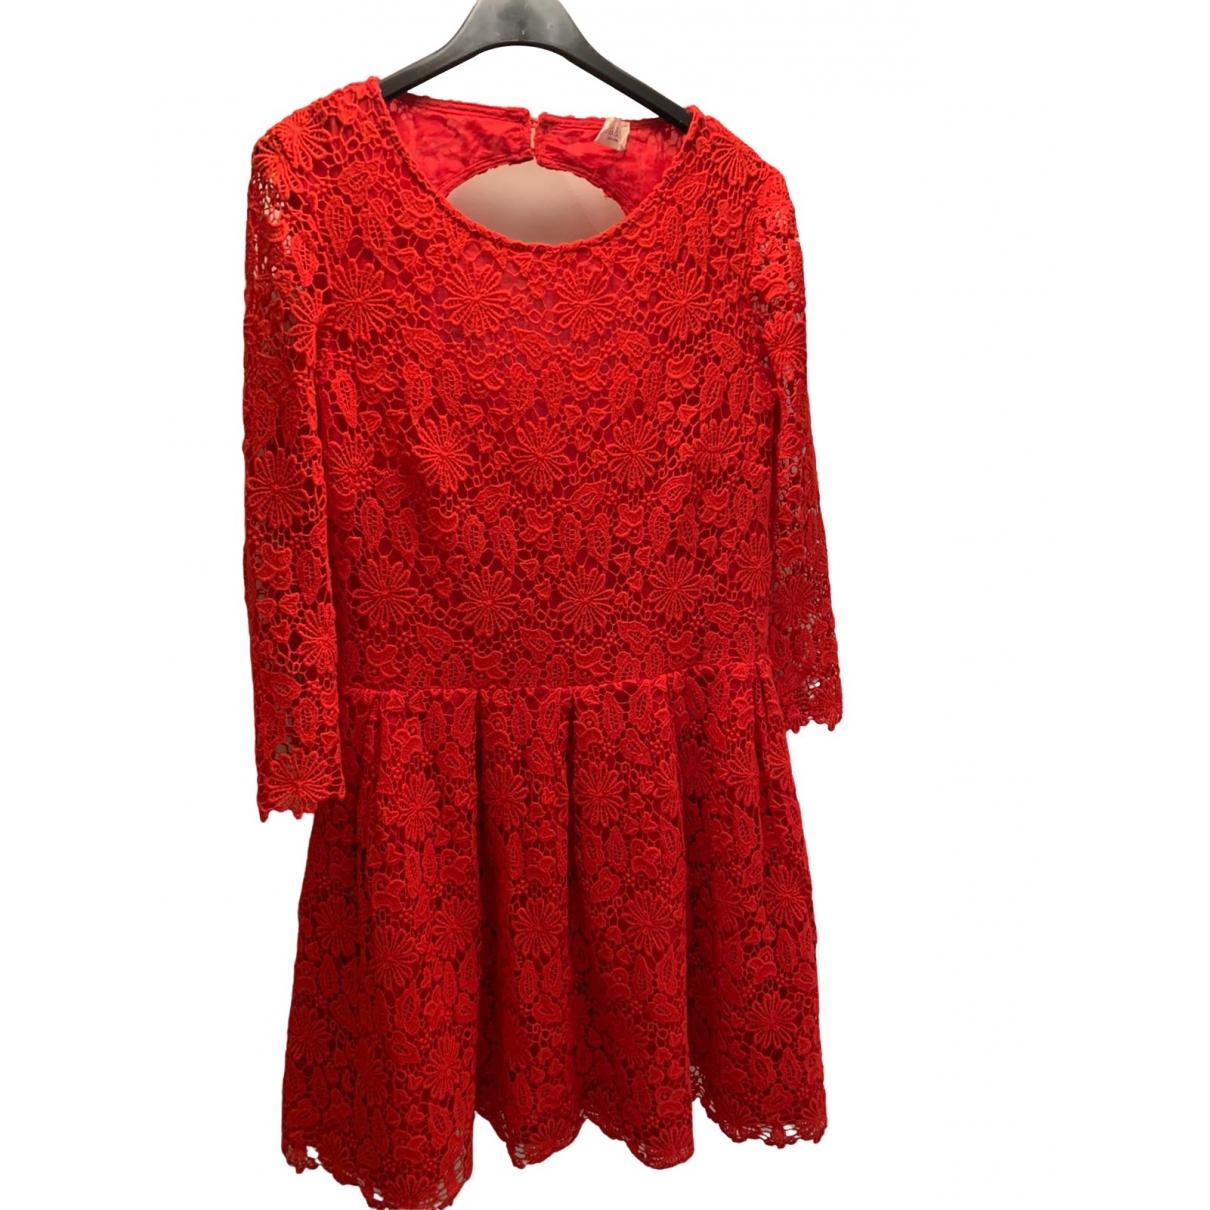 Ba&sh \N Red Lace dress for Women 38 FR